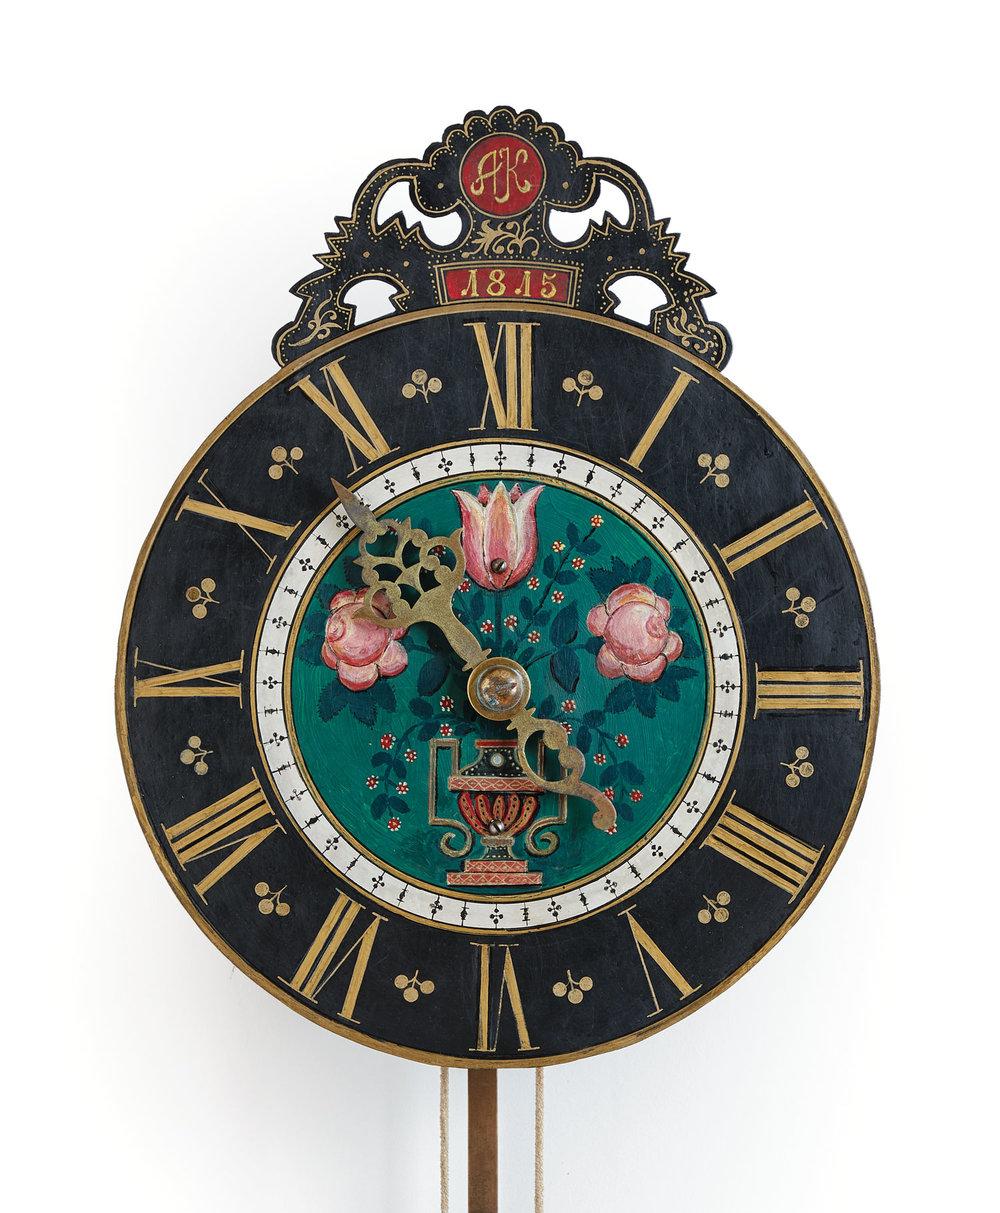 Werder Clock, ca. 1815 (MC0008)